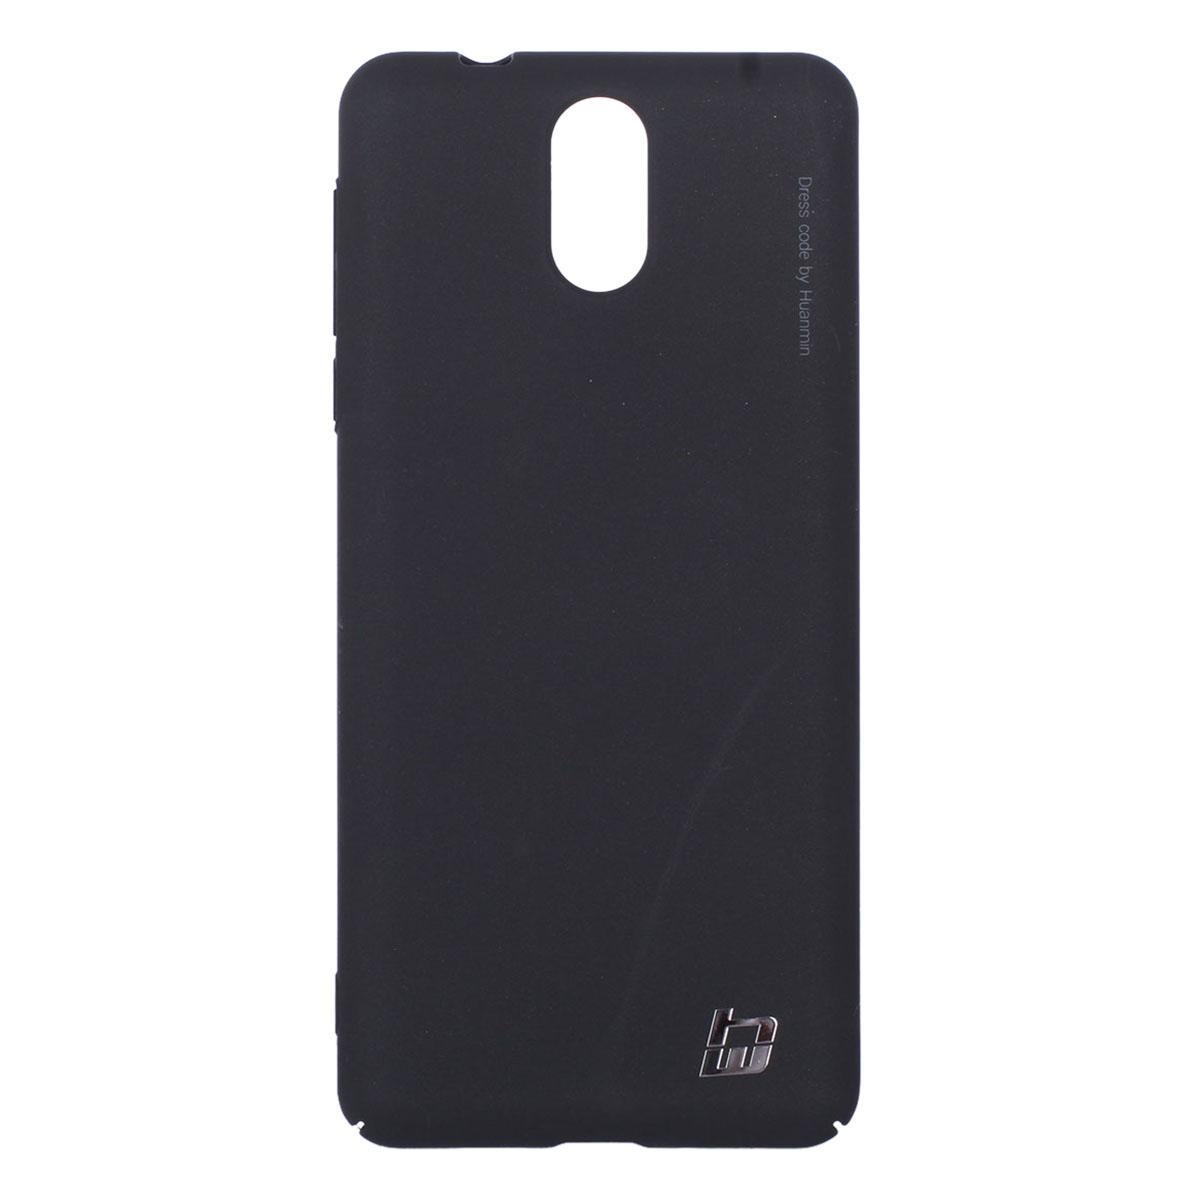 on sale 6b910 87441 Nokia 3.1 Hard Back Cover